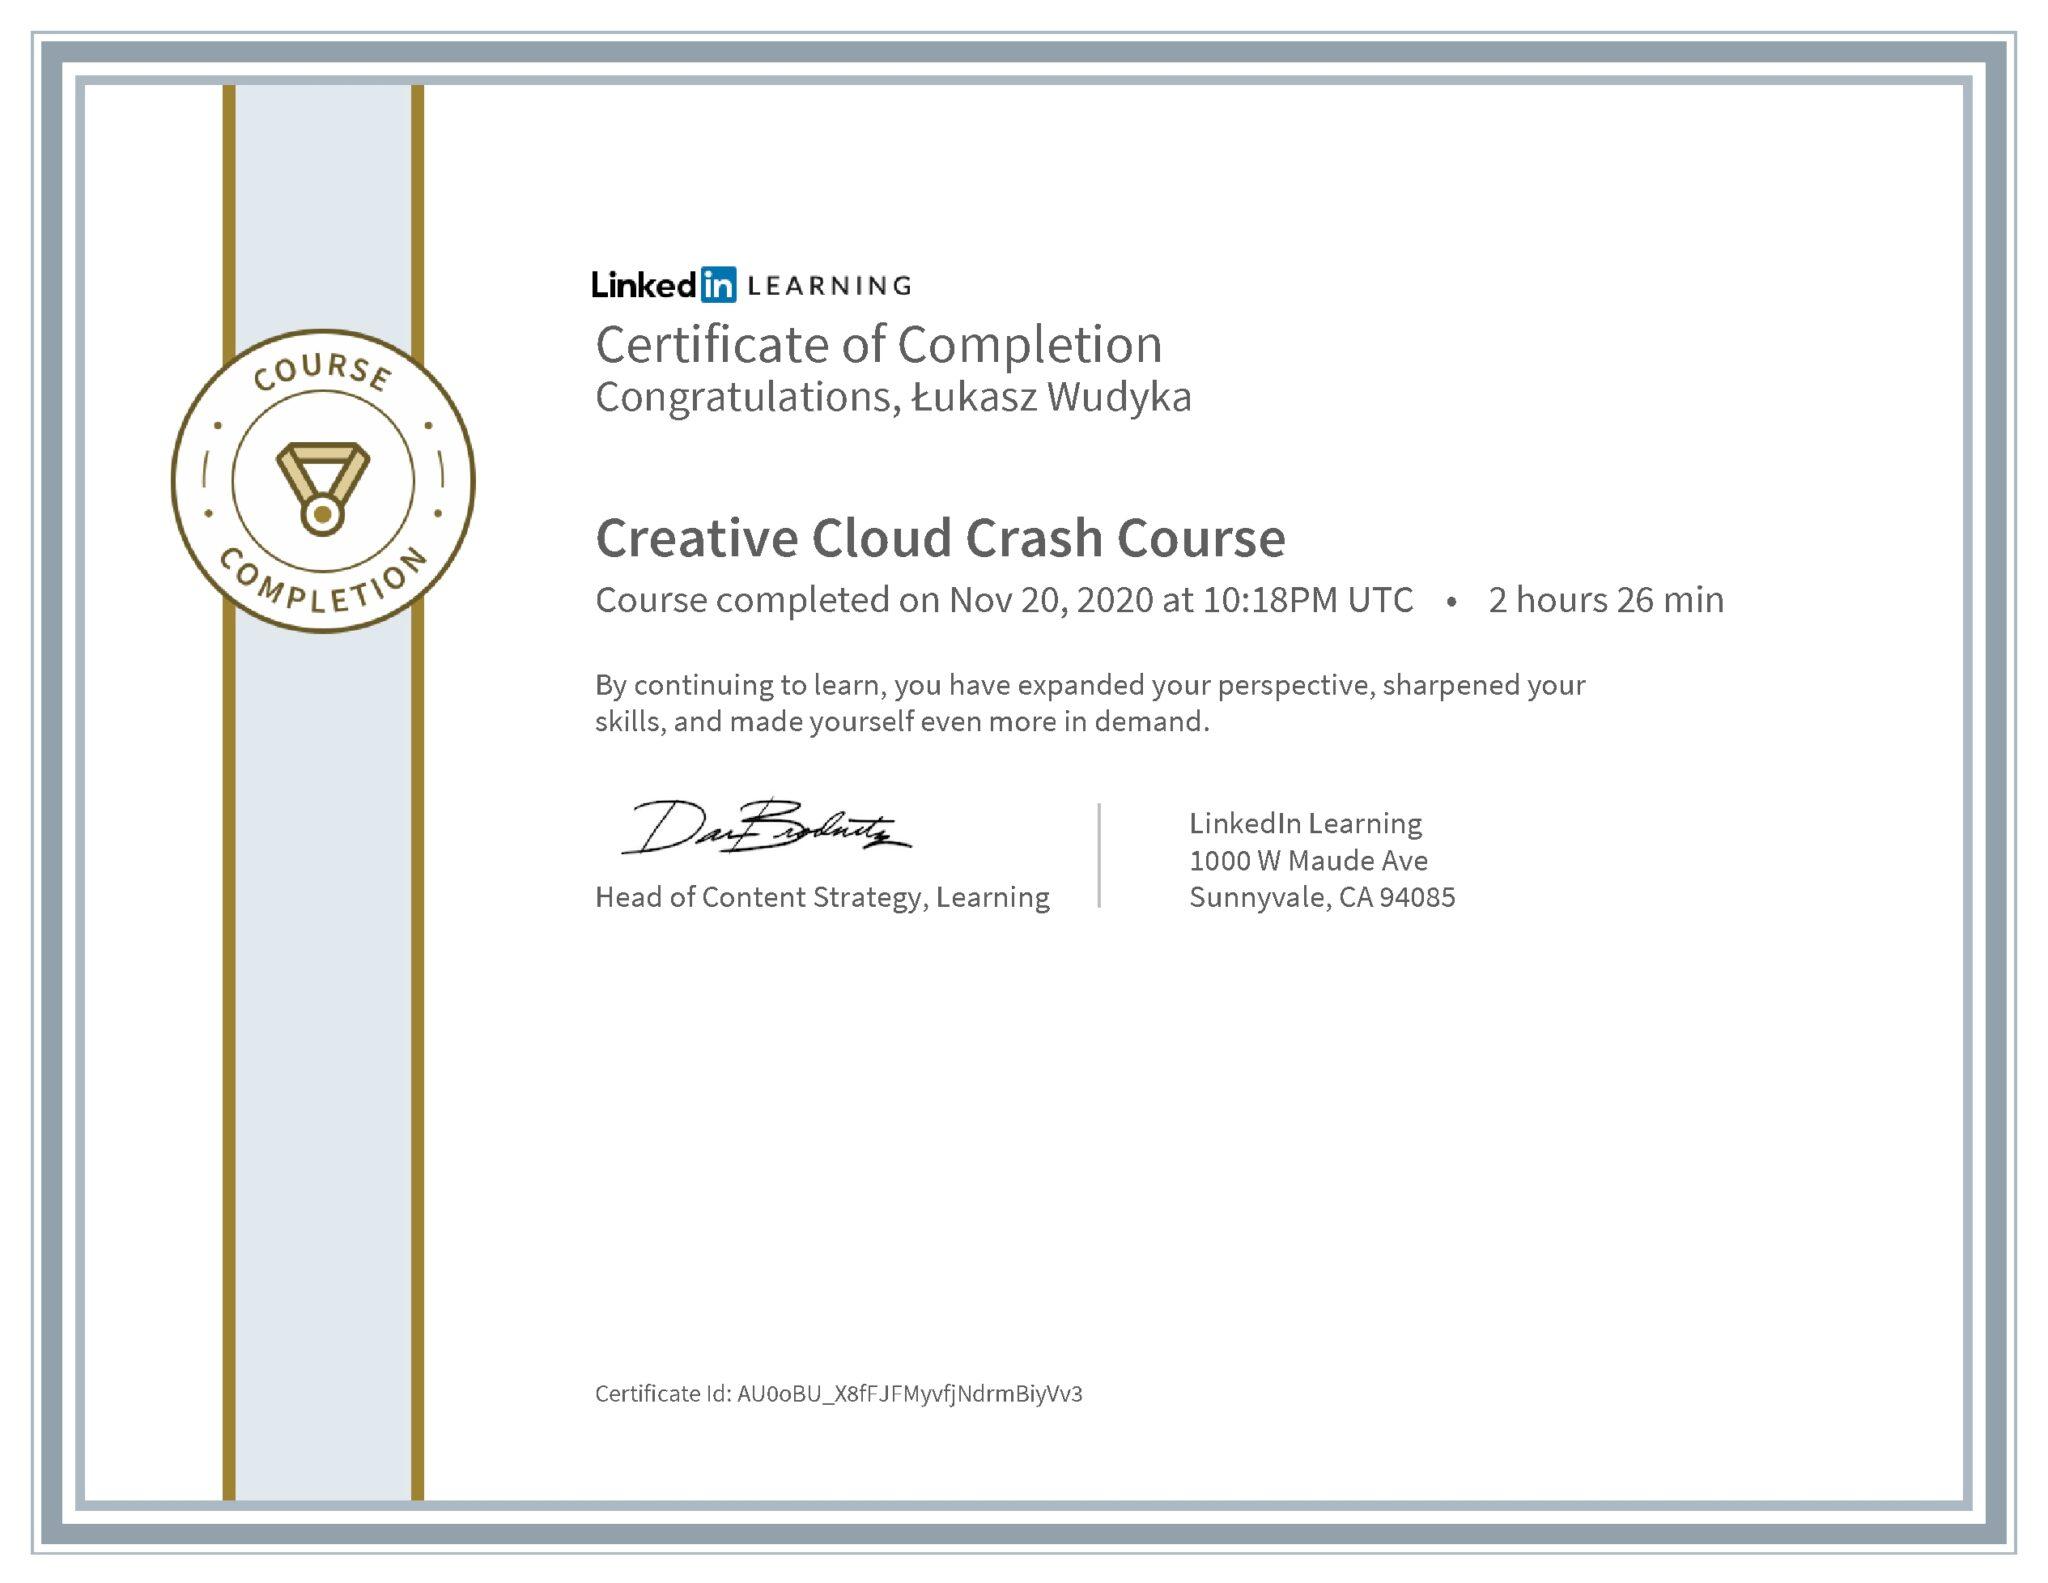 Łukasz Wudyka certyfikat LinkedIn Creative Cloud Crash Course